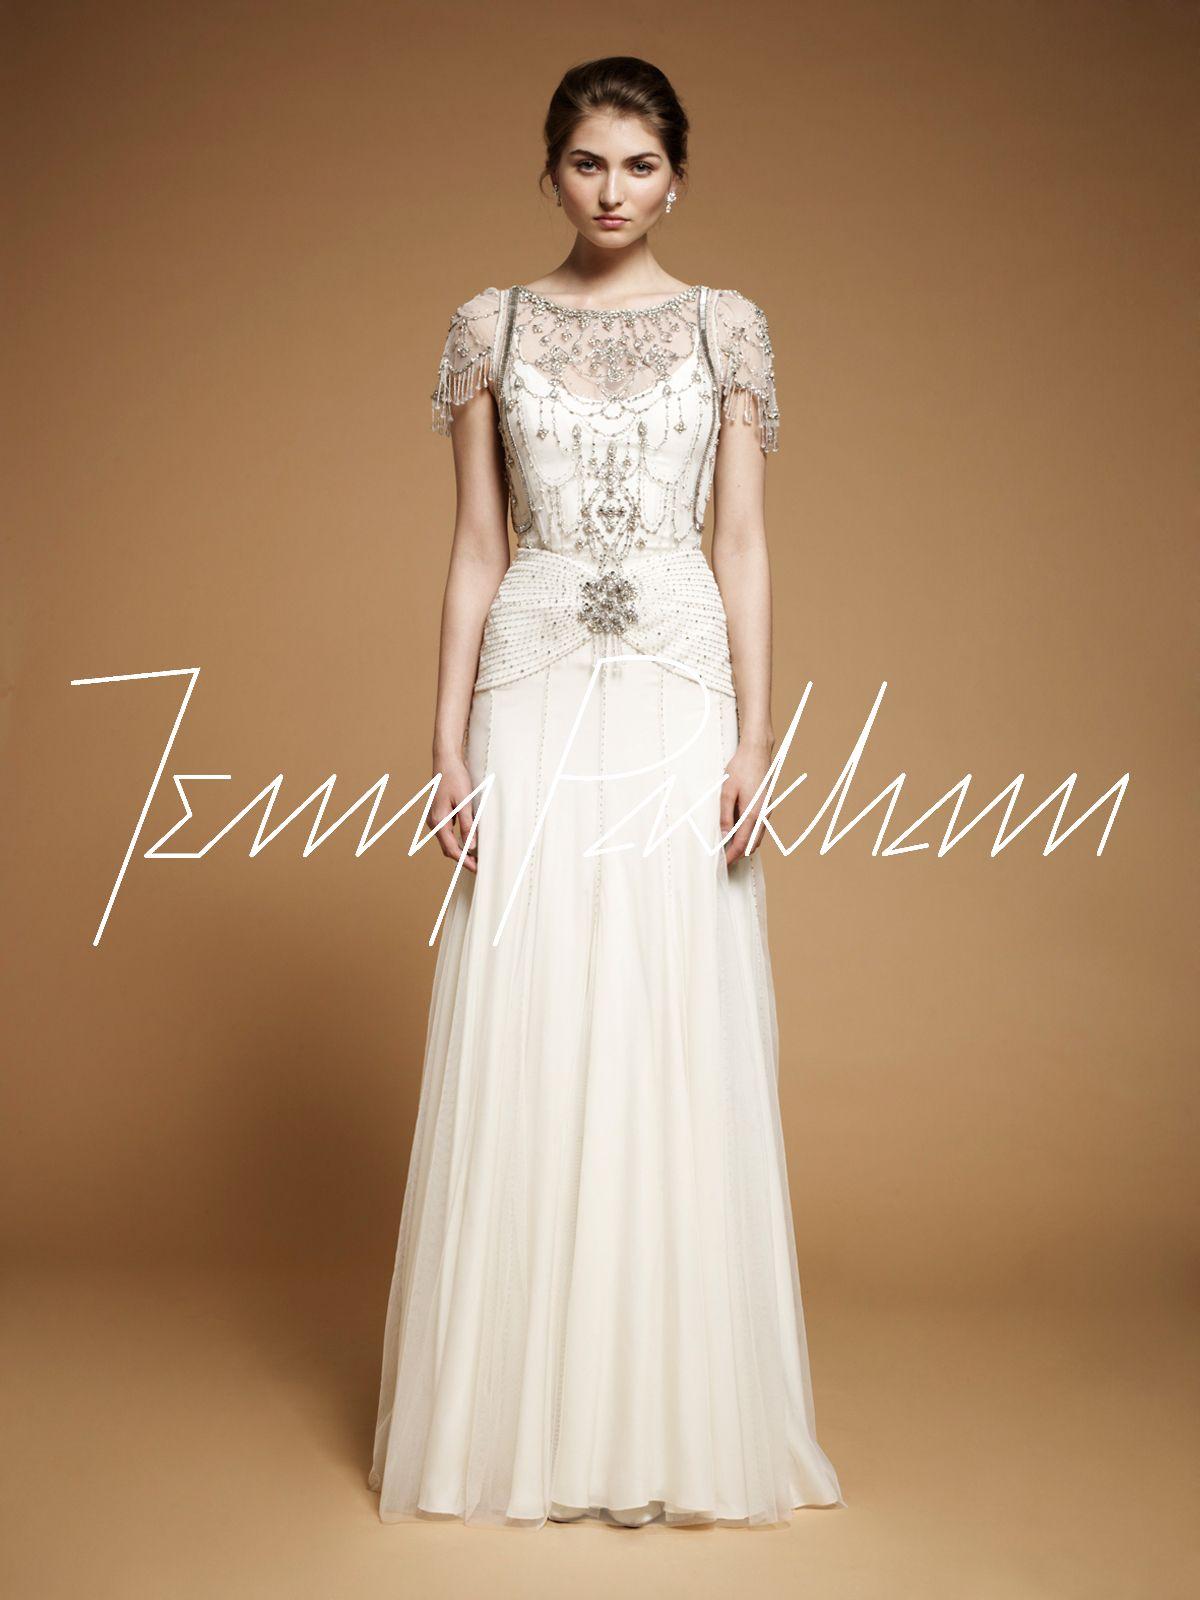 Vintage style wedding gown damasks jenny packham and wedding dress